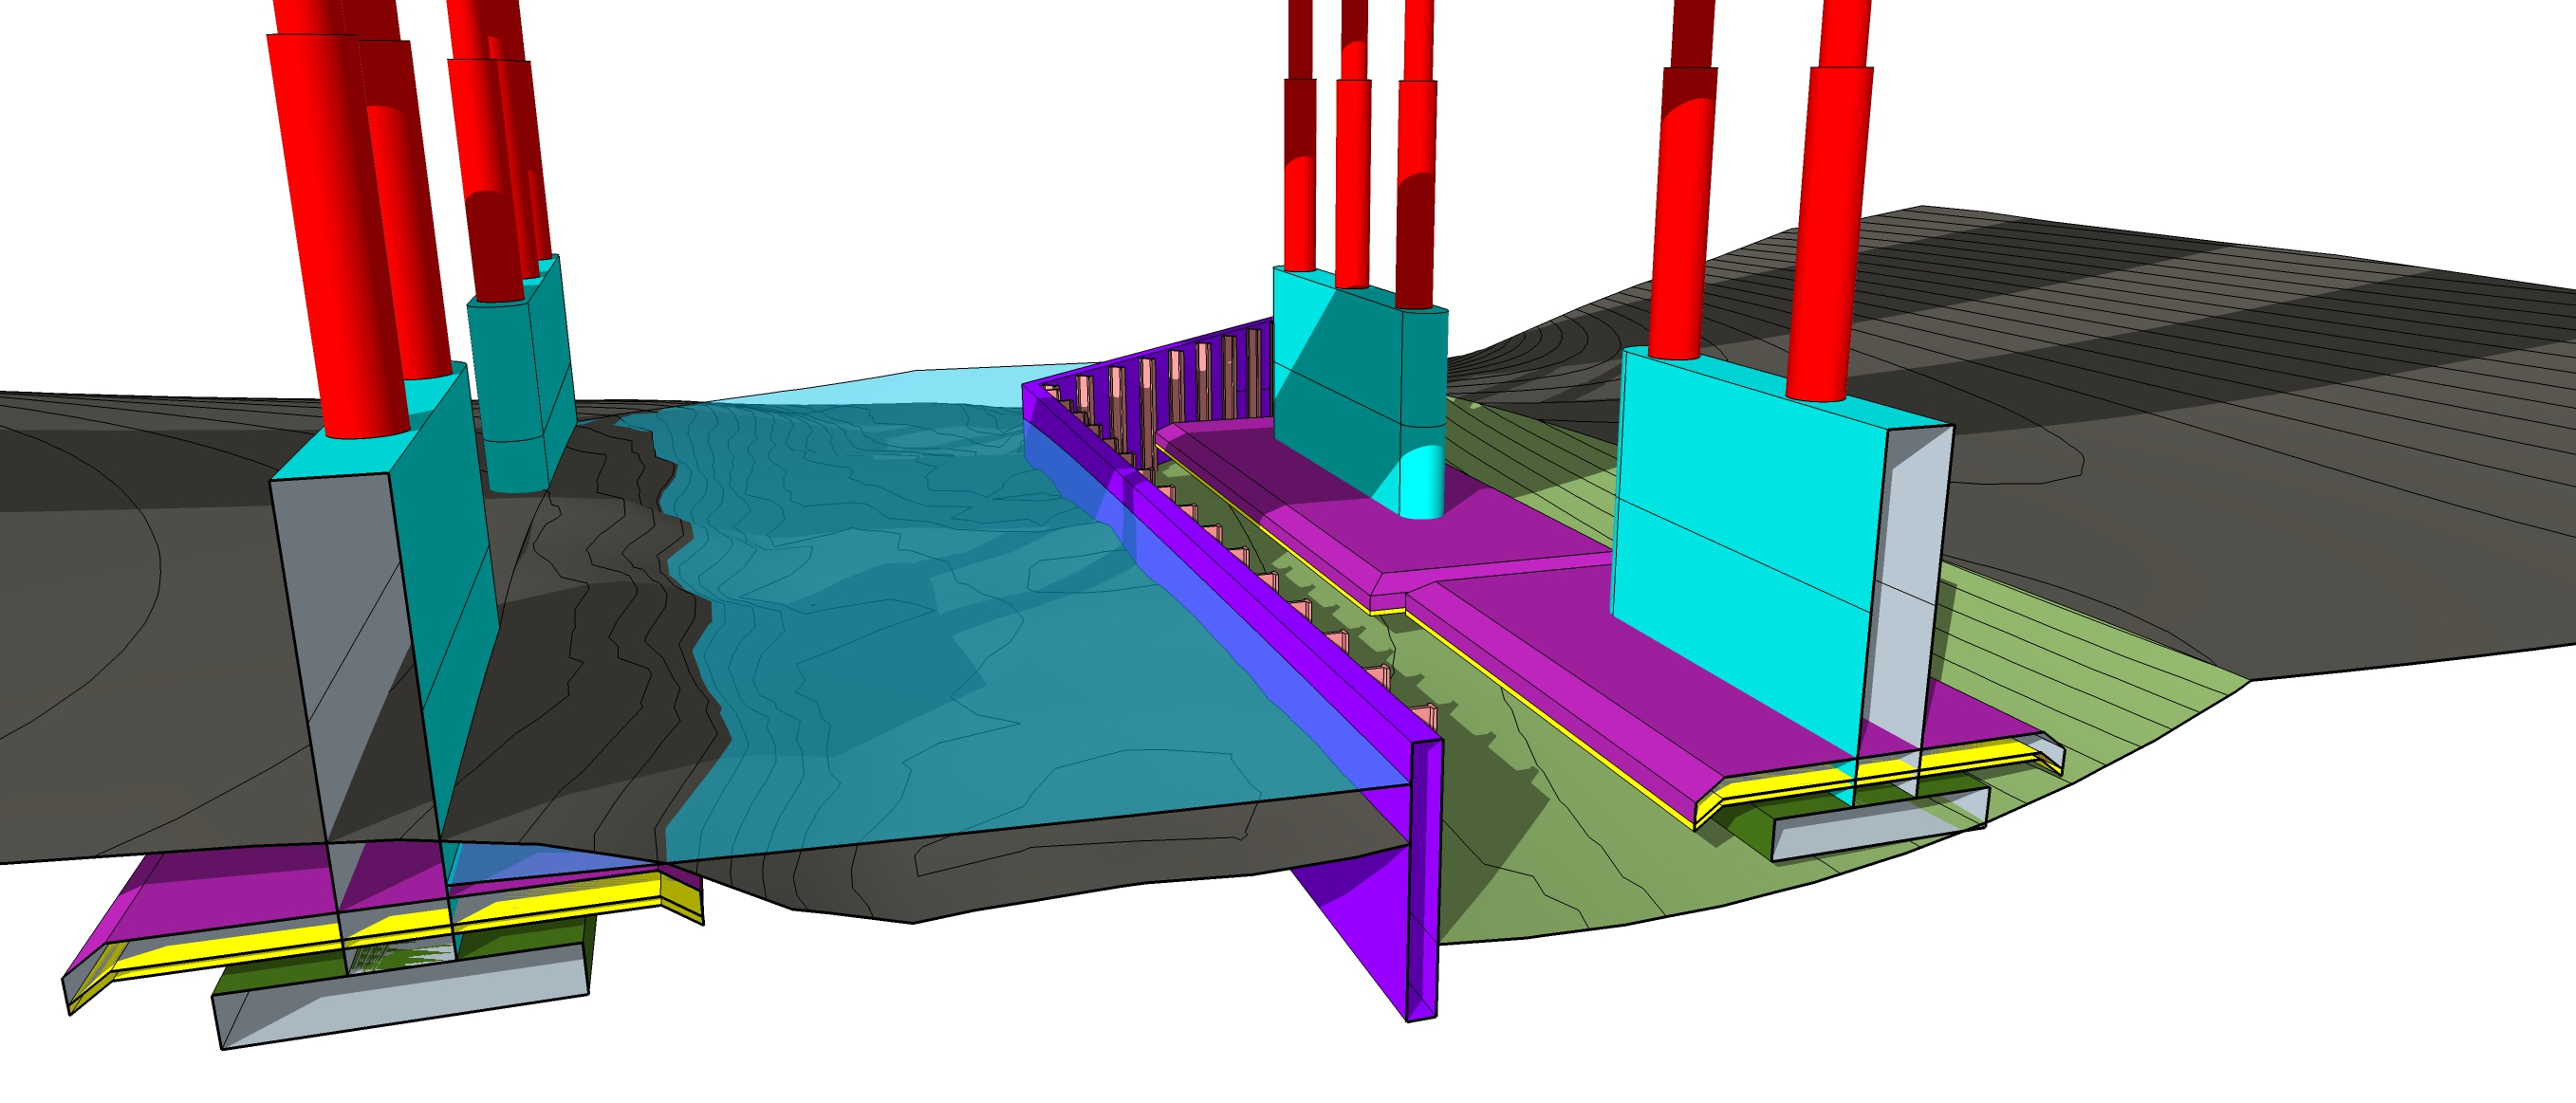 I-80 bridge phasing model (Truckee)